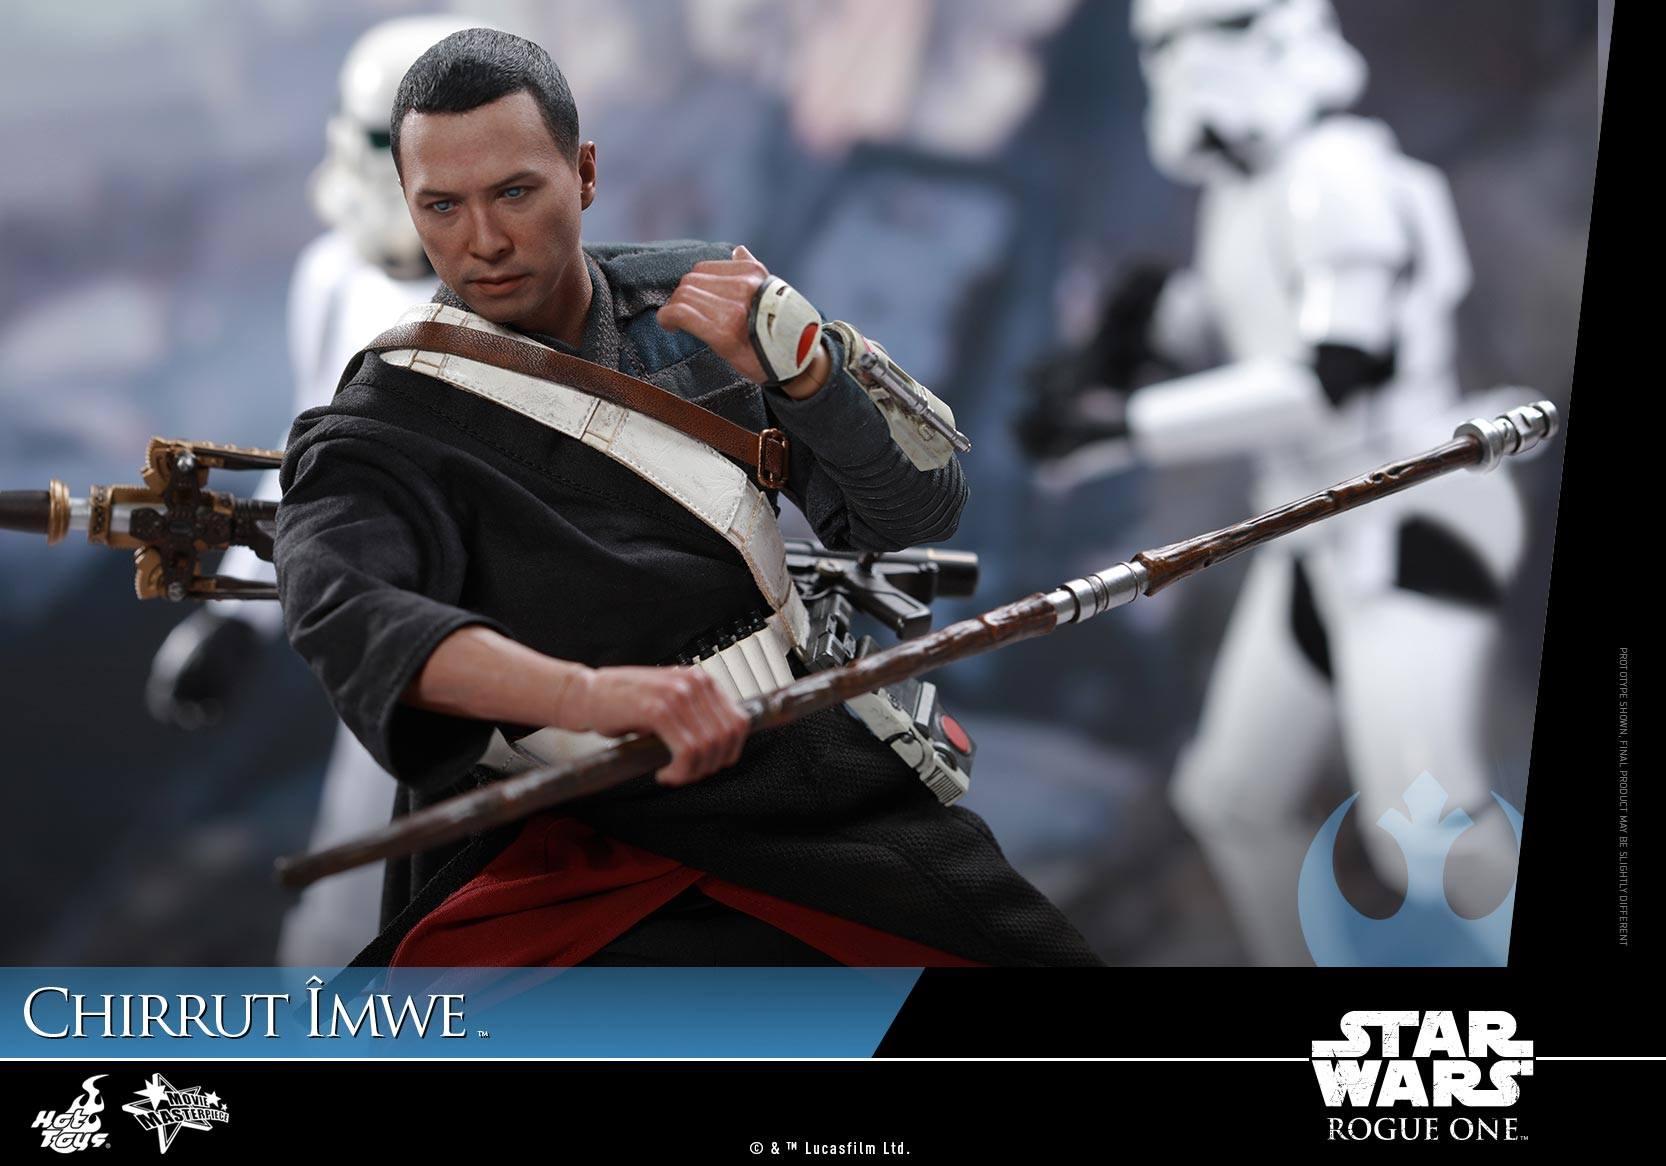 Rogue One Hot Toys Chirrut Imwe action figure